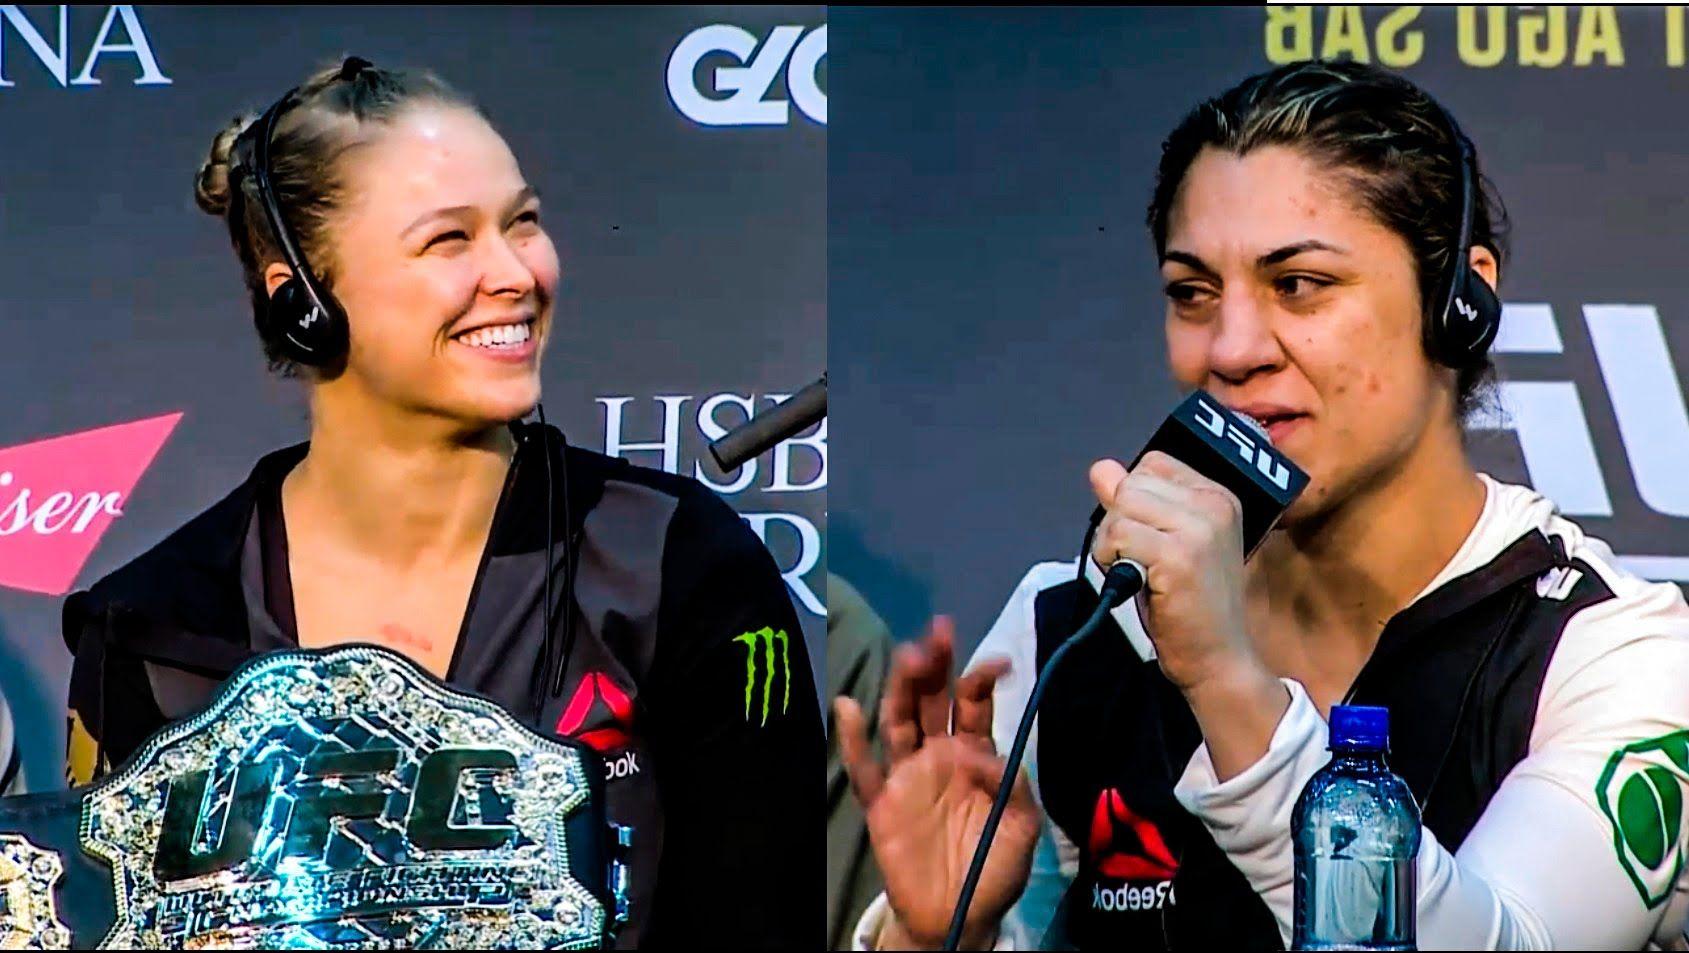 Ufc 190 Post Fight Press Conference Ronda Rousey Vs Bethe Correia